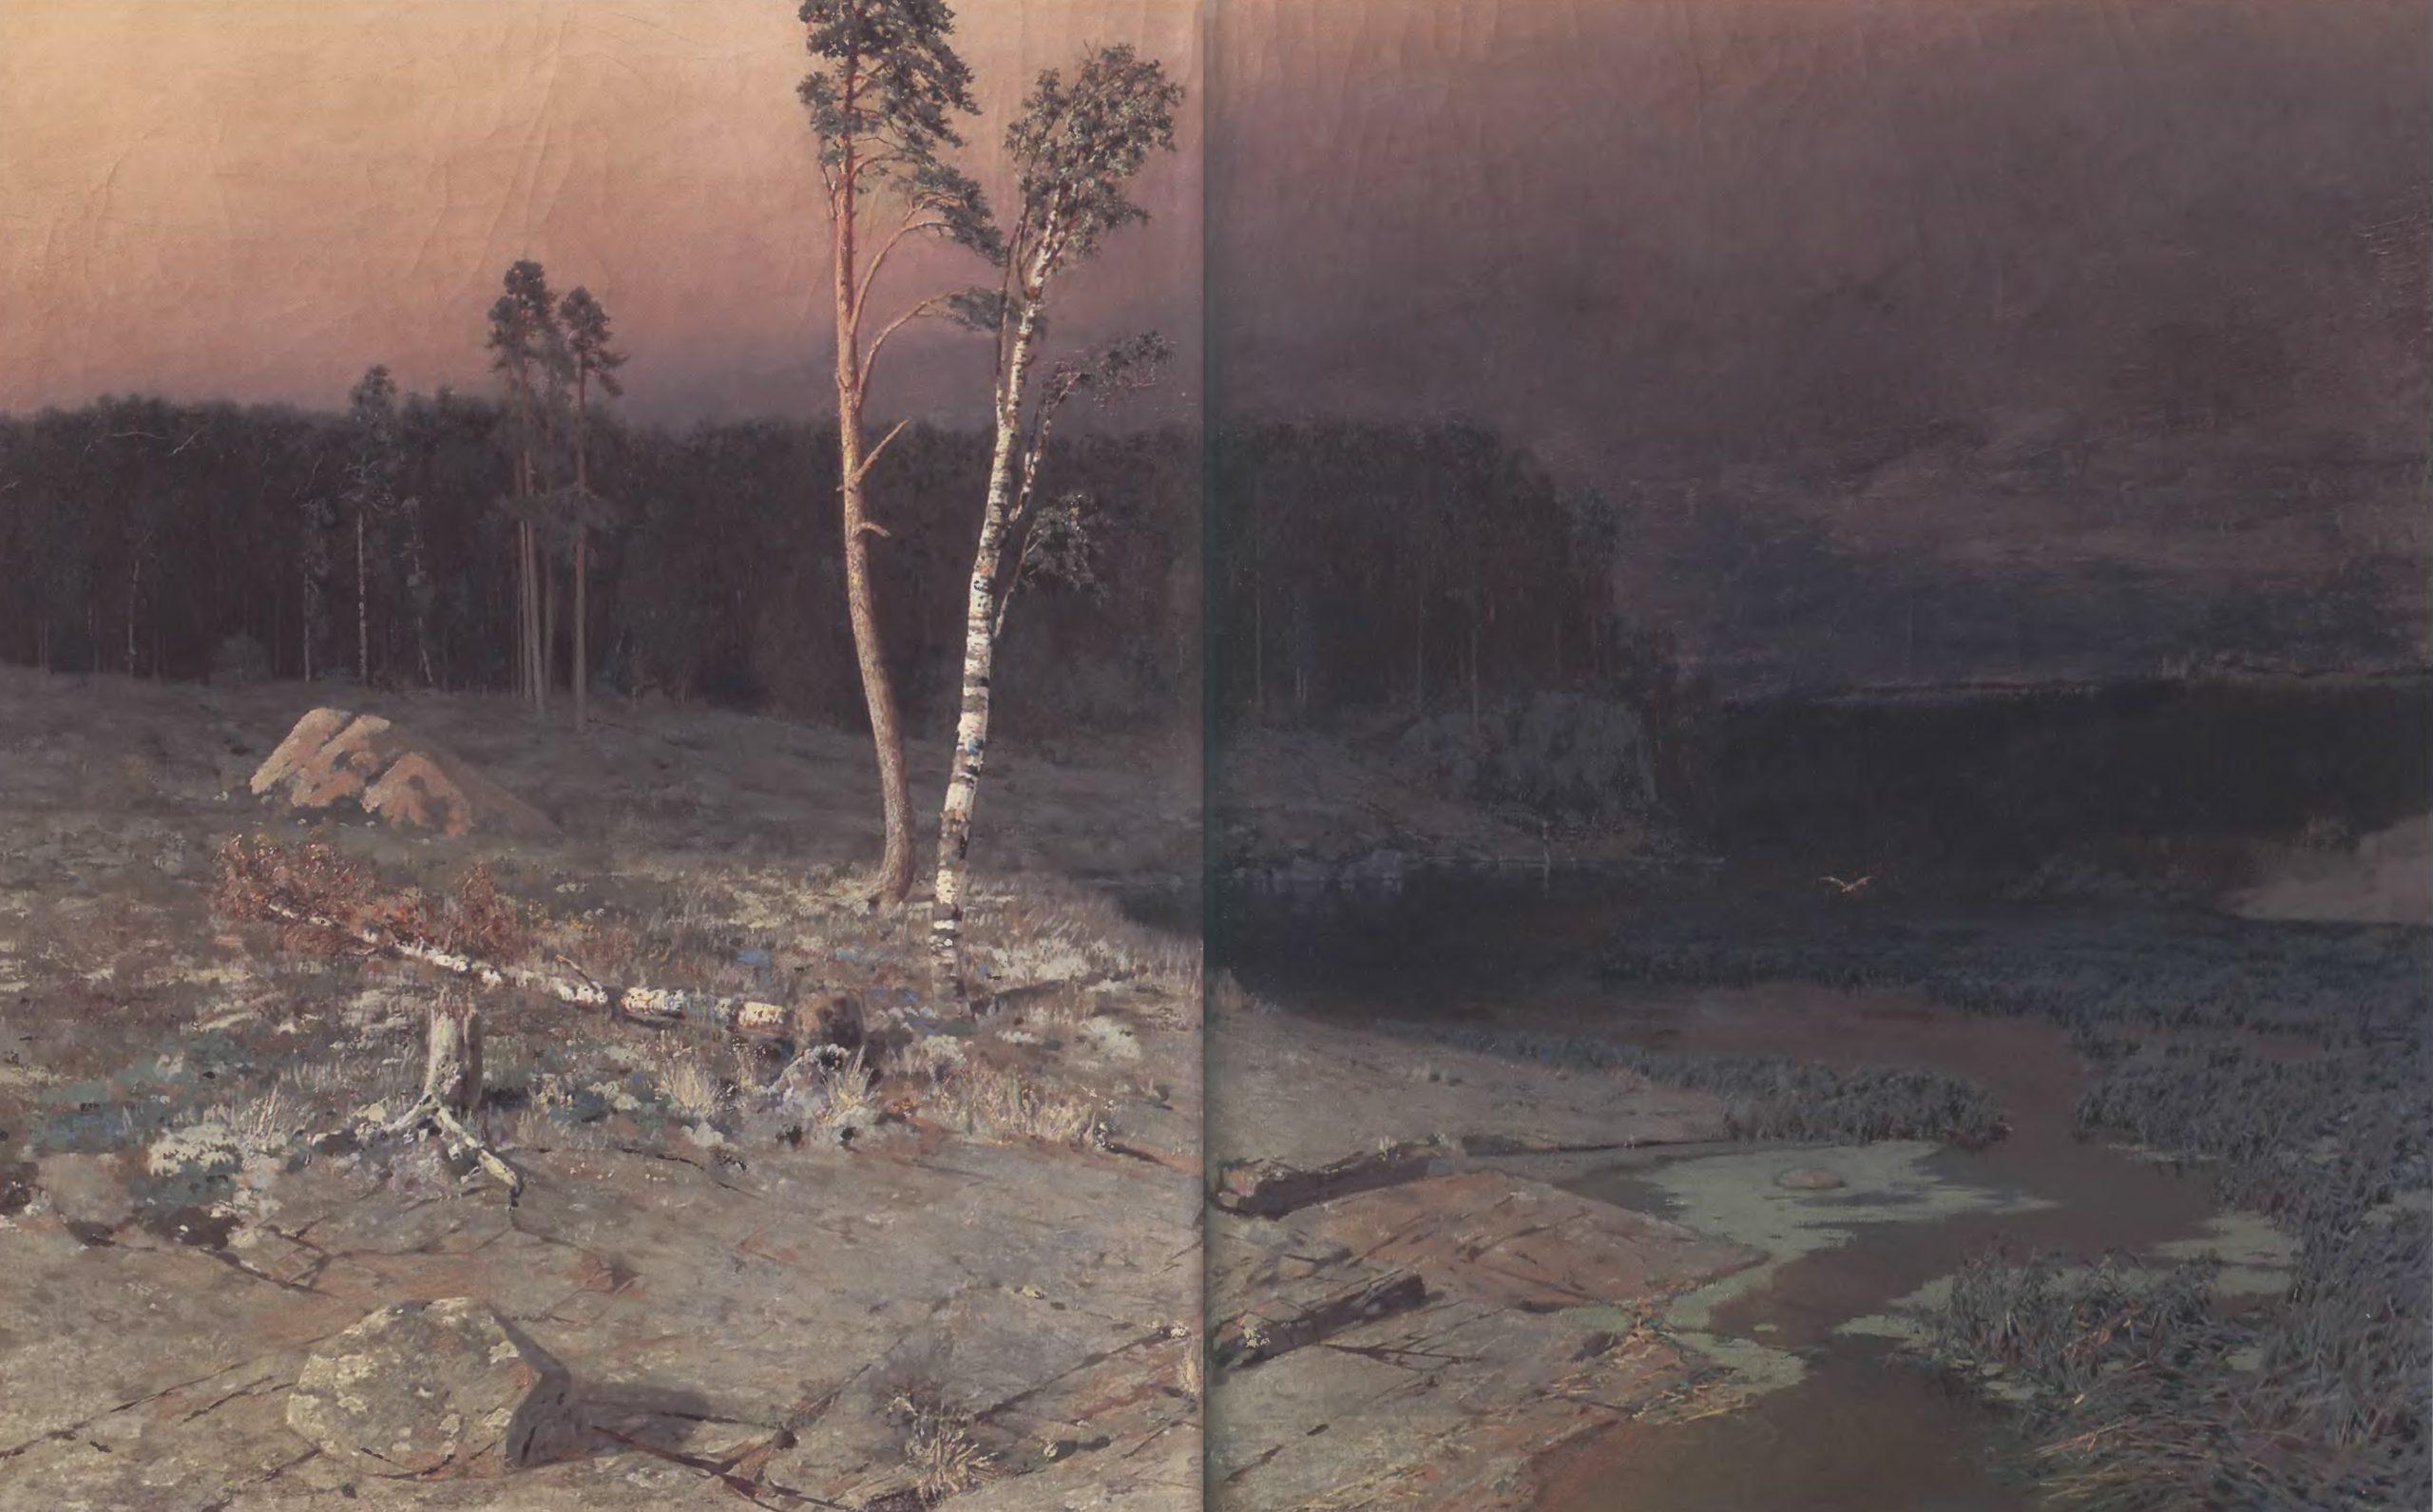 АРХИП КУИНДЖИ. На острове Валааме. 1873. Холст, масло. 76 х 130 см. Государственная Третьяковская галерея